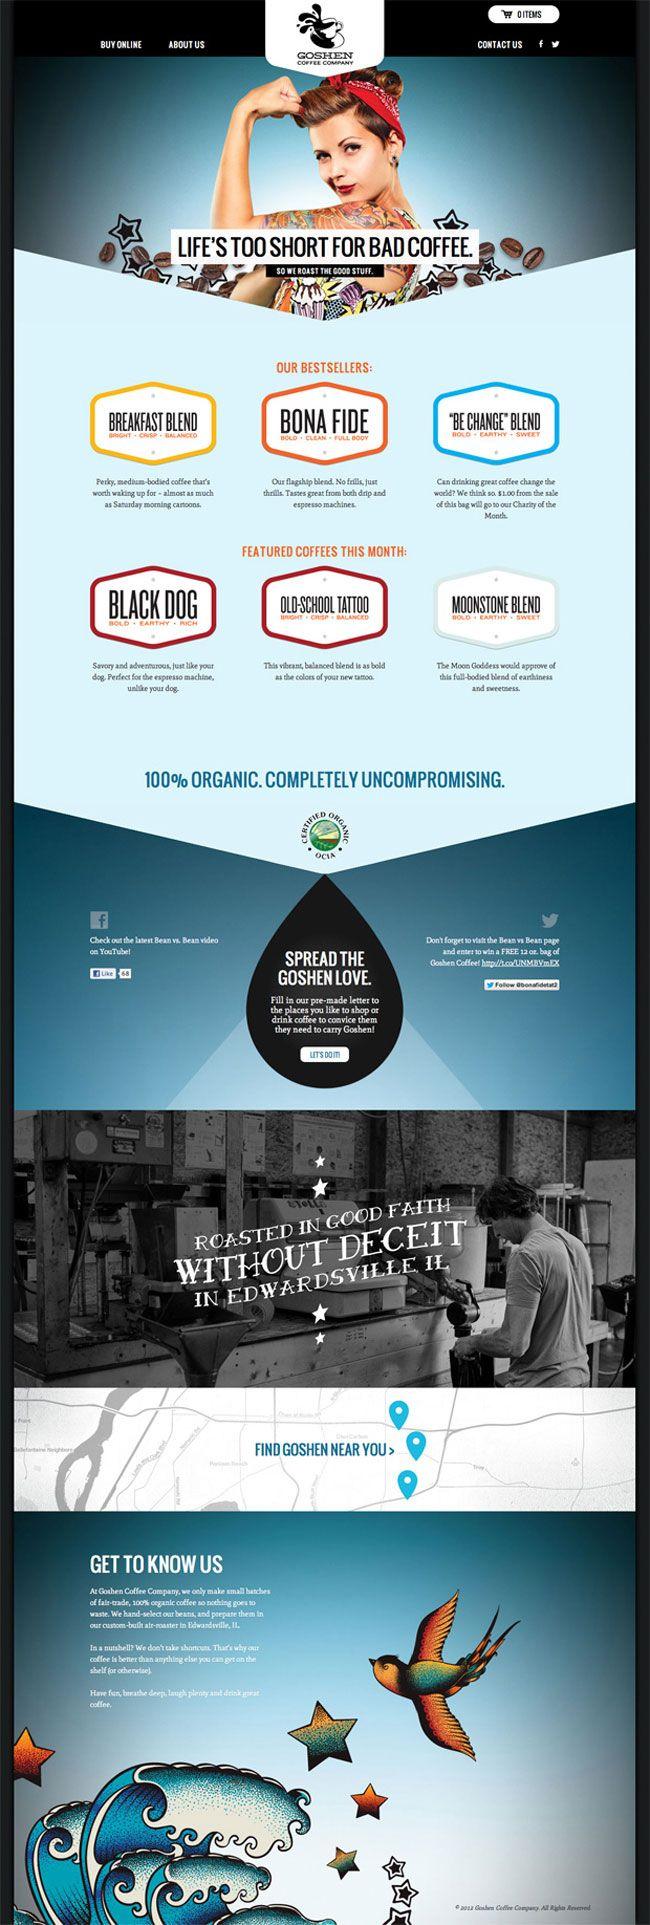 270 best Web Design images on Pinterest | Graphics, Editorial design ...